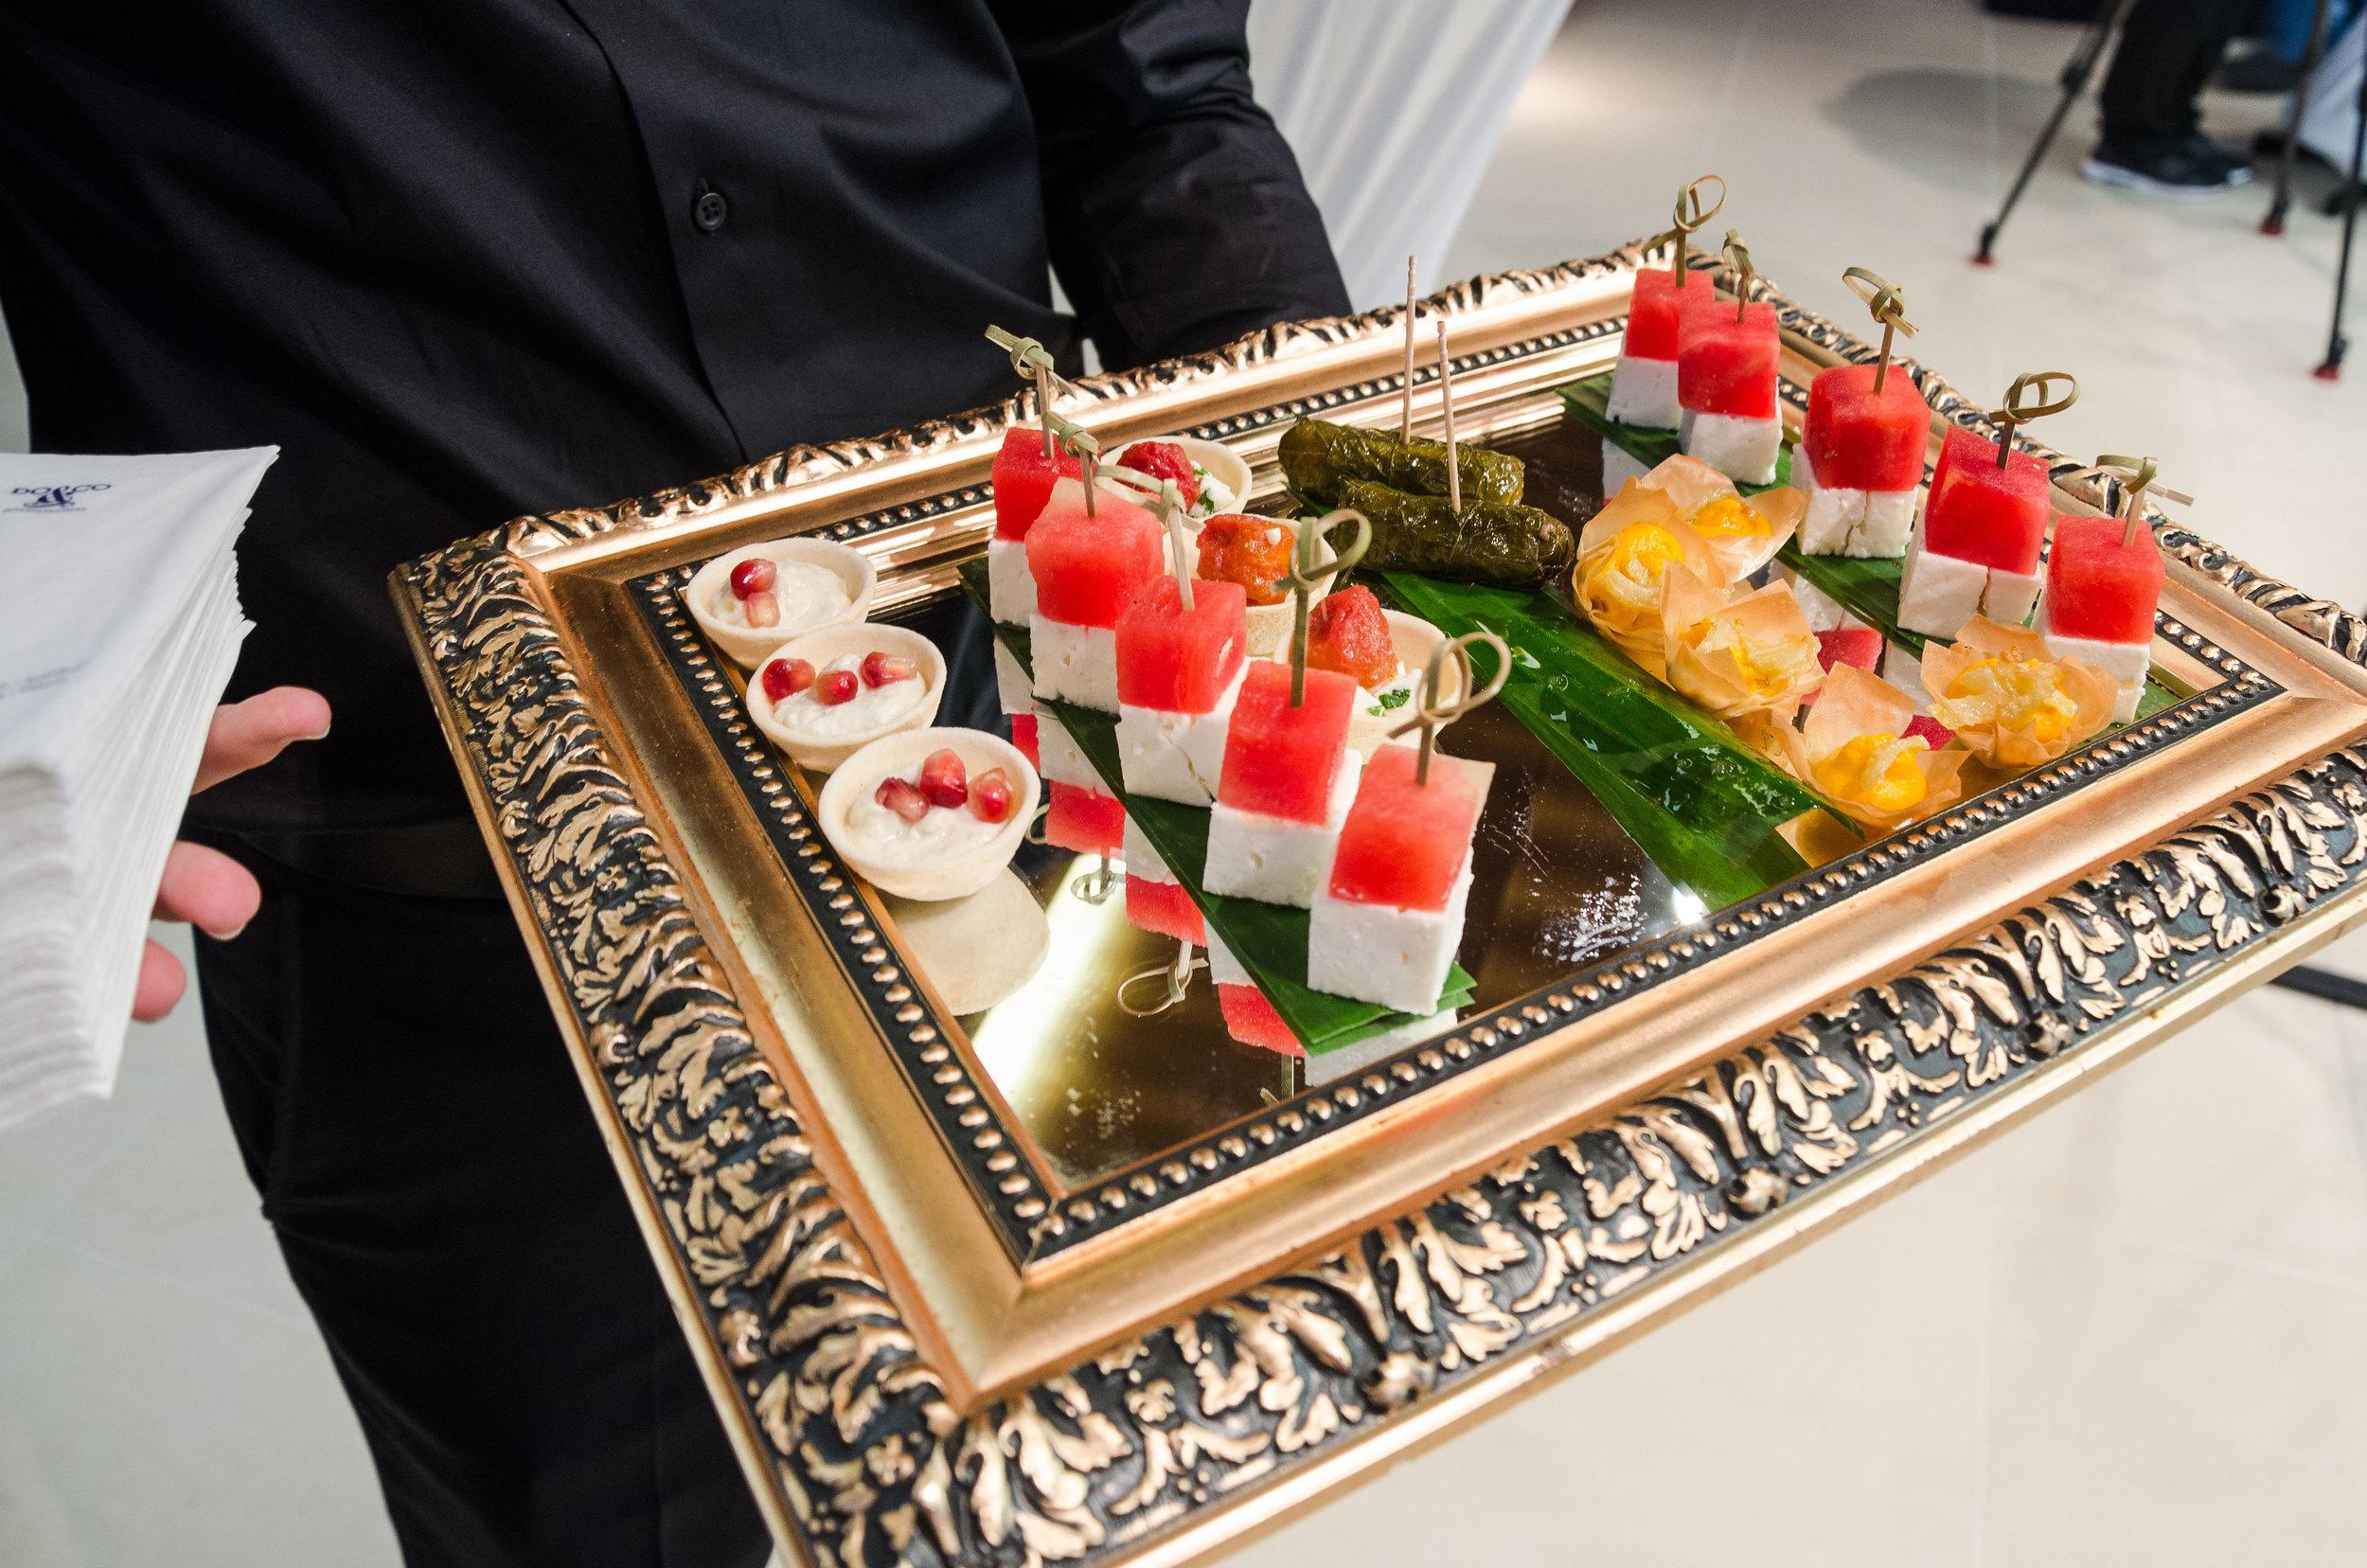 A large variety of imaginative Canapés